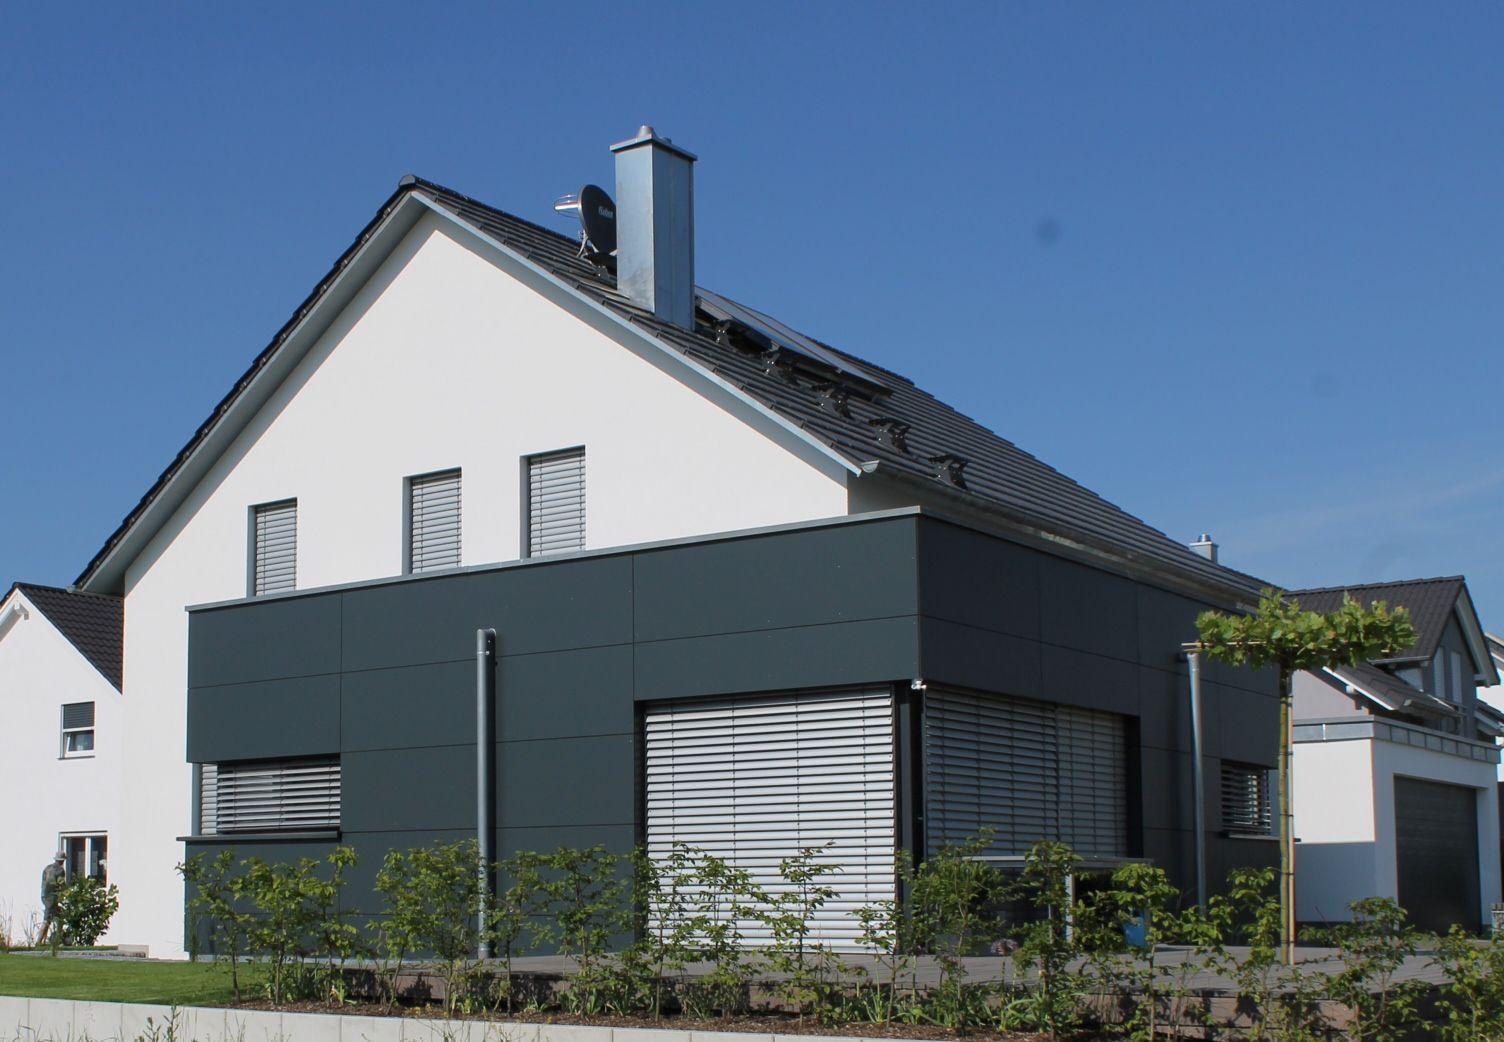 pin von catharina wagner auf anbau hausfassade pinterest anbau hausfassaden und fassaden. Black Bedroom Furniture Sets. Home Design Ideas